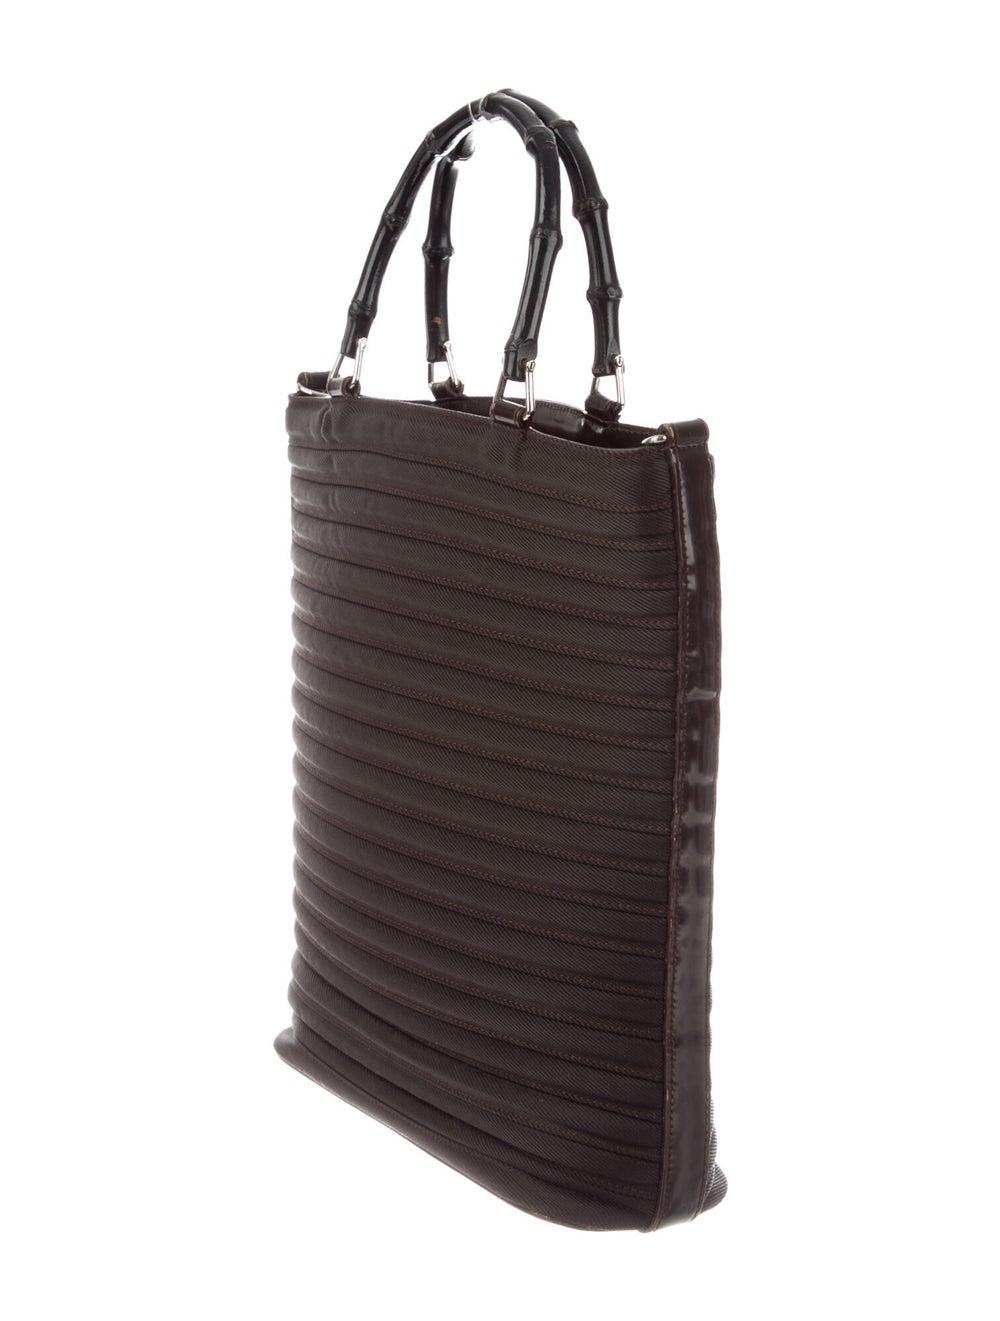 Gucci Vintage Diana Nylon Bamboo Handle Bag Brown - image 3